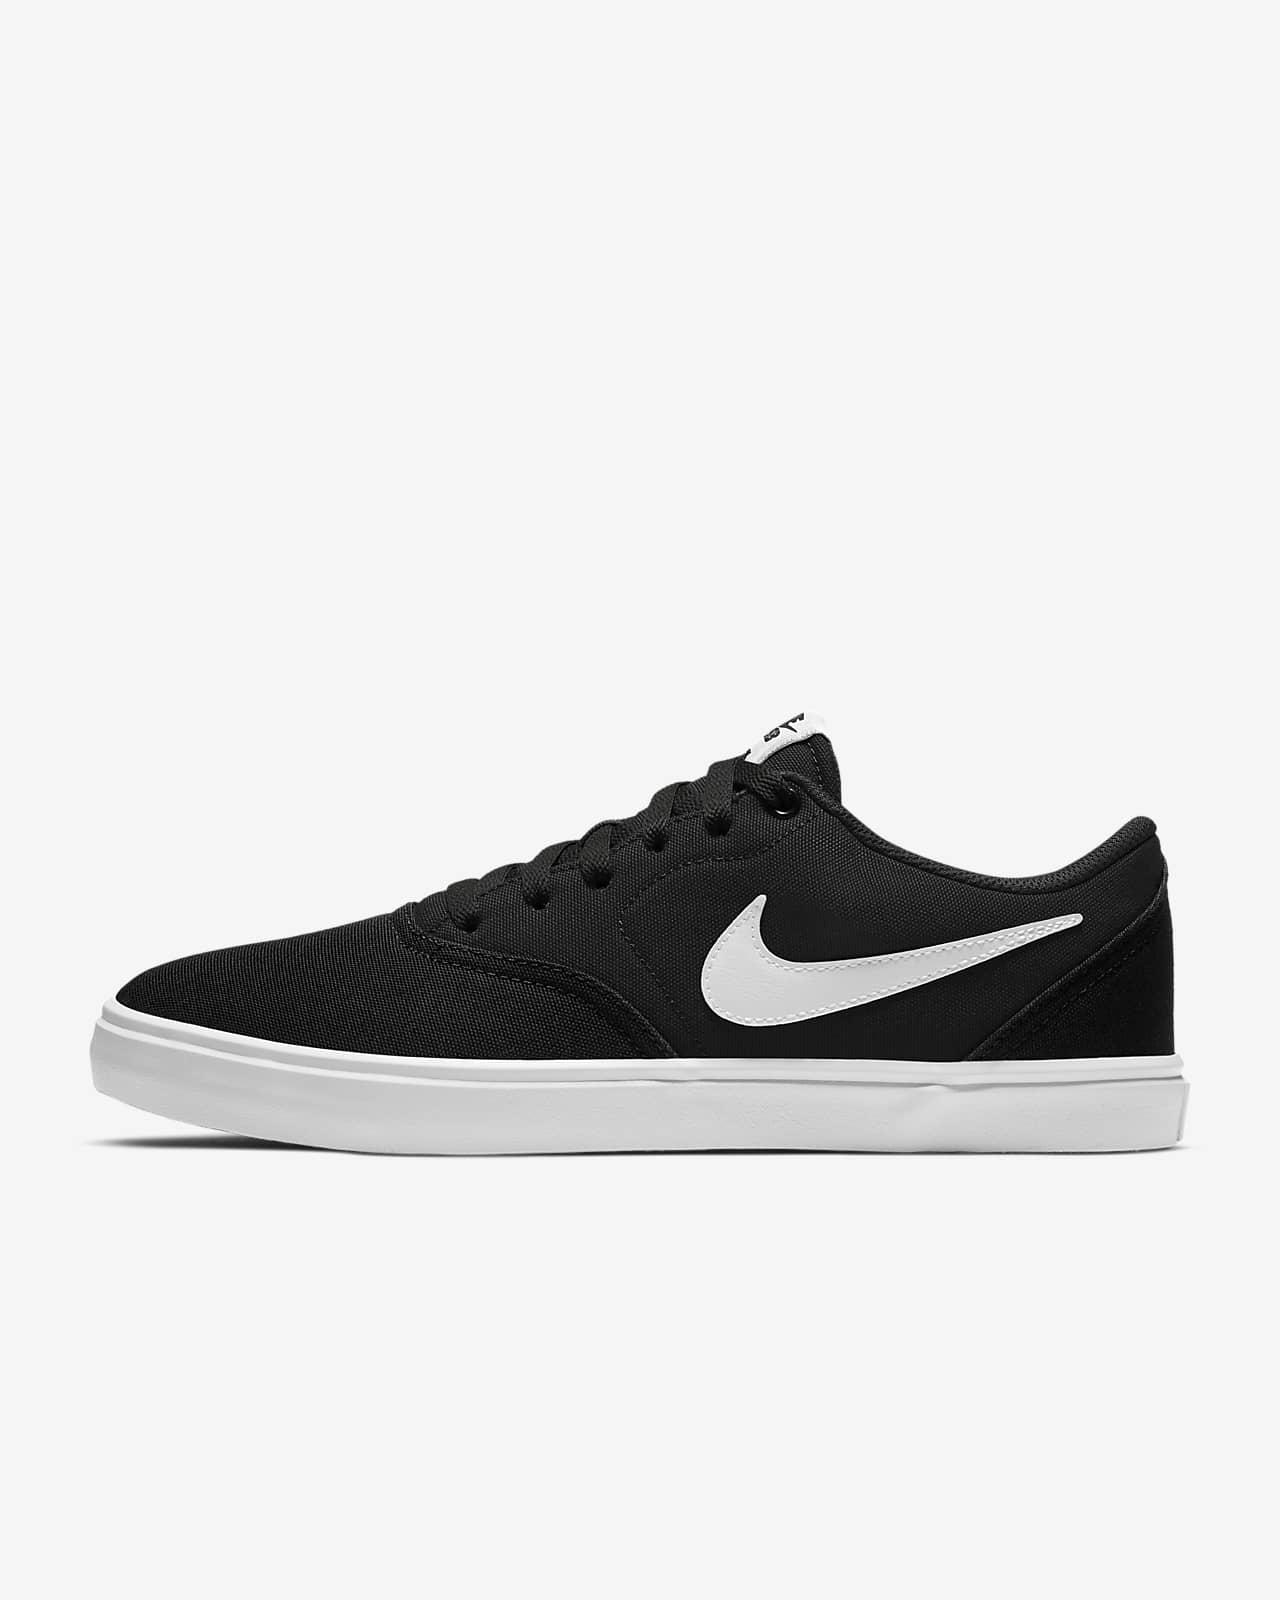 Nike SB Check Solarsoft Canvas Skate Shoe